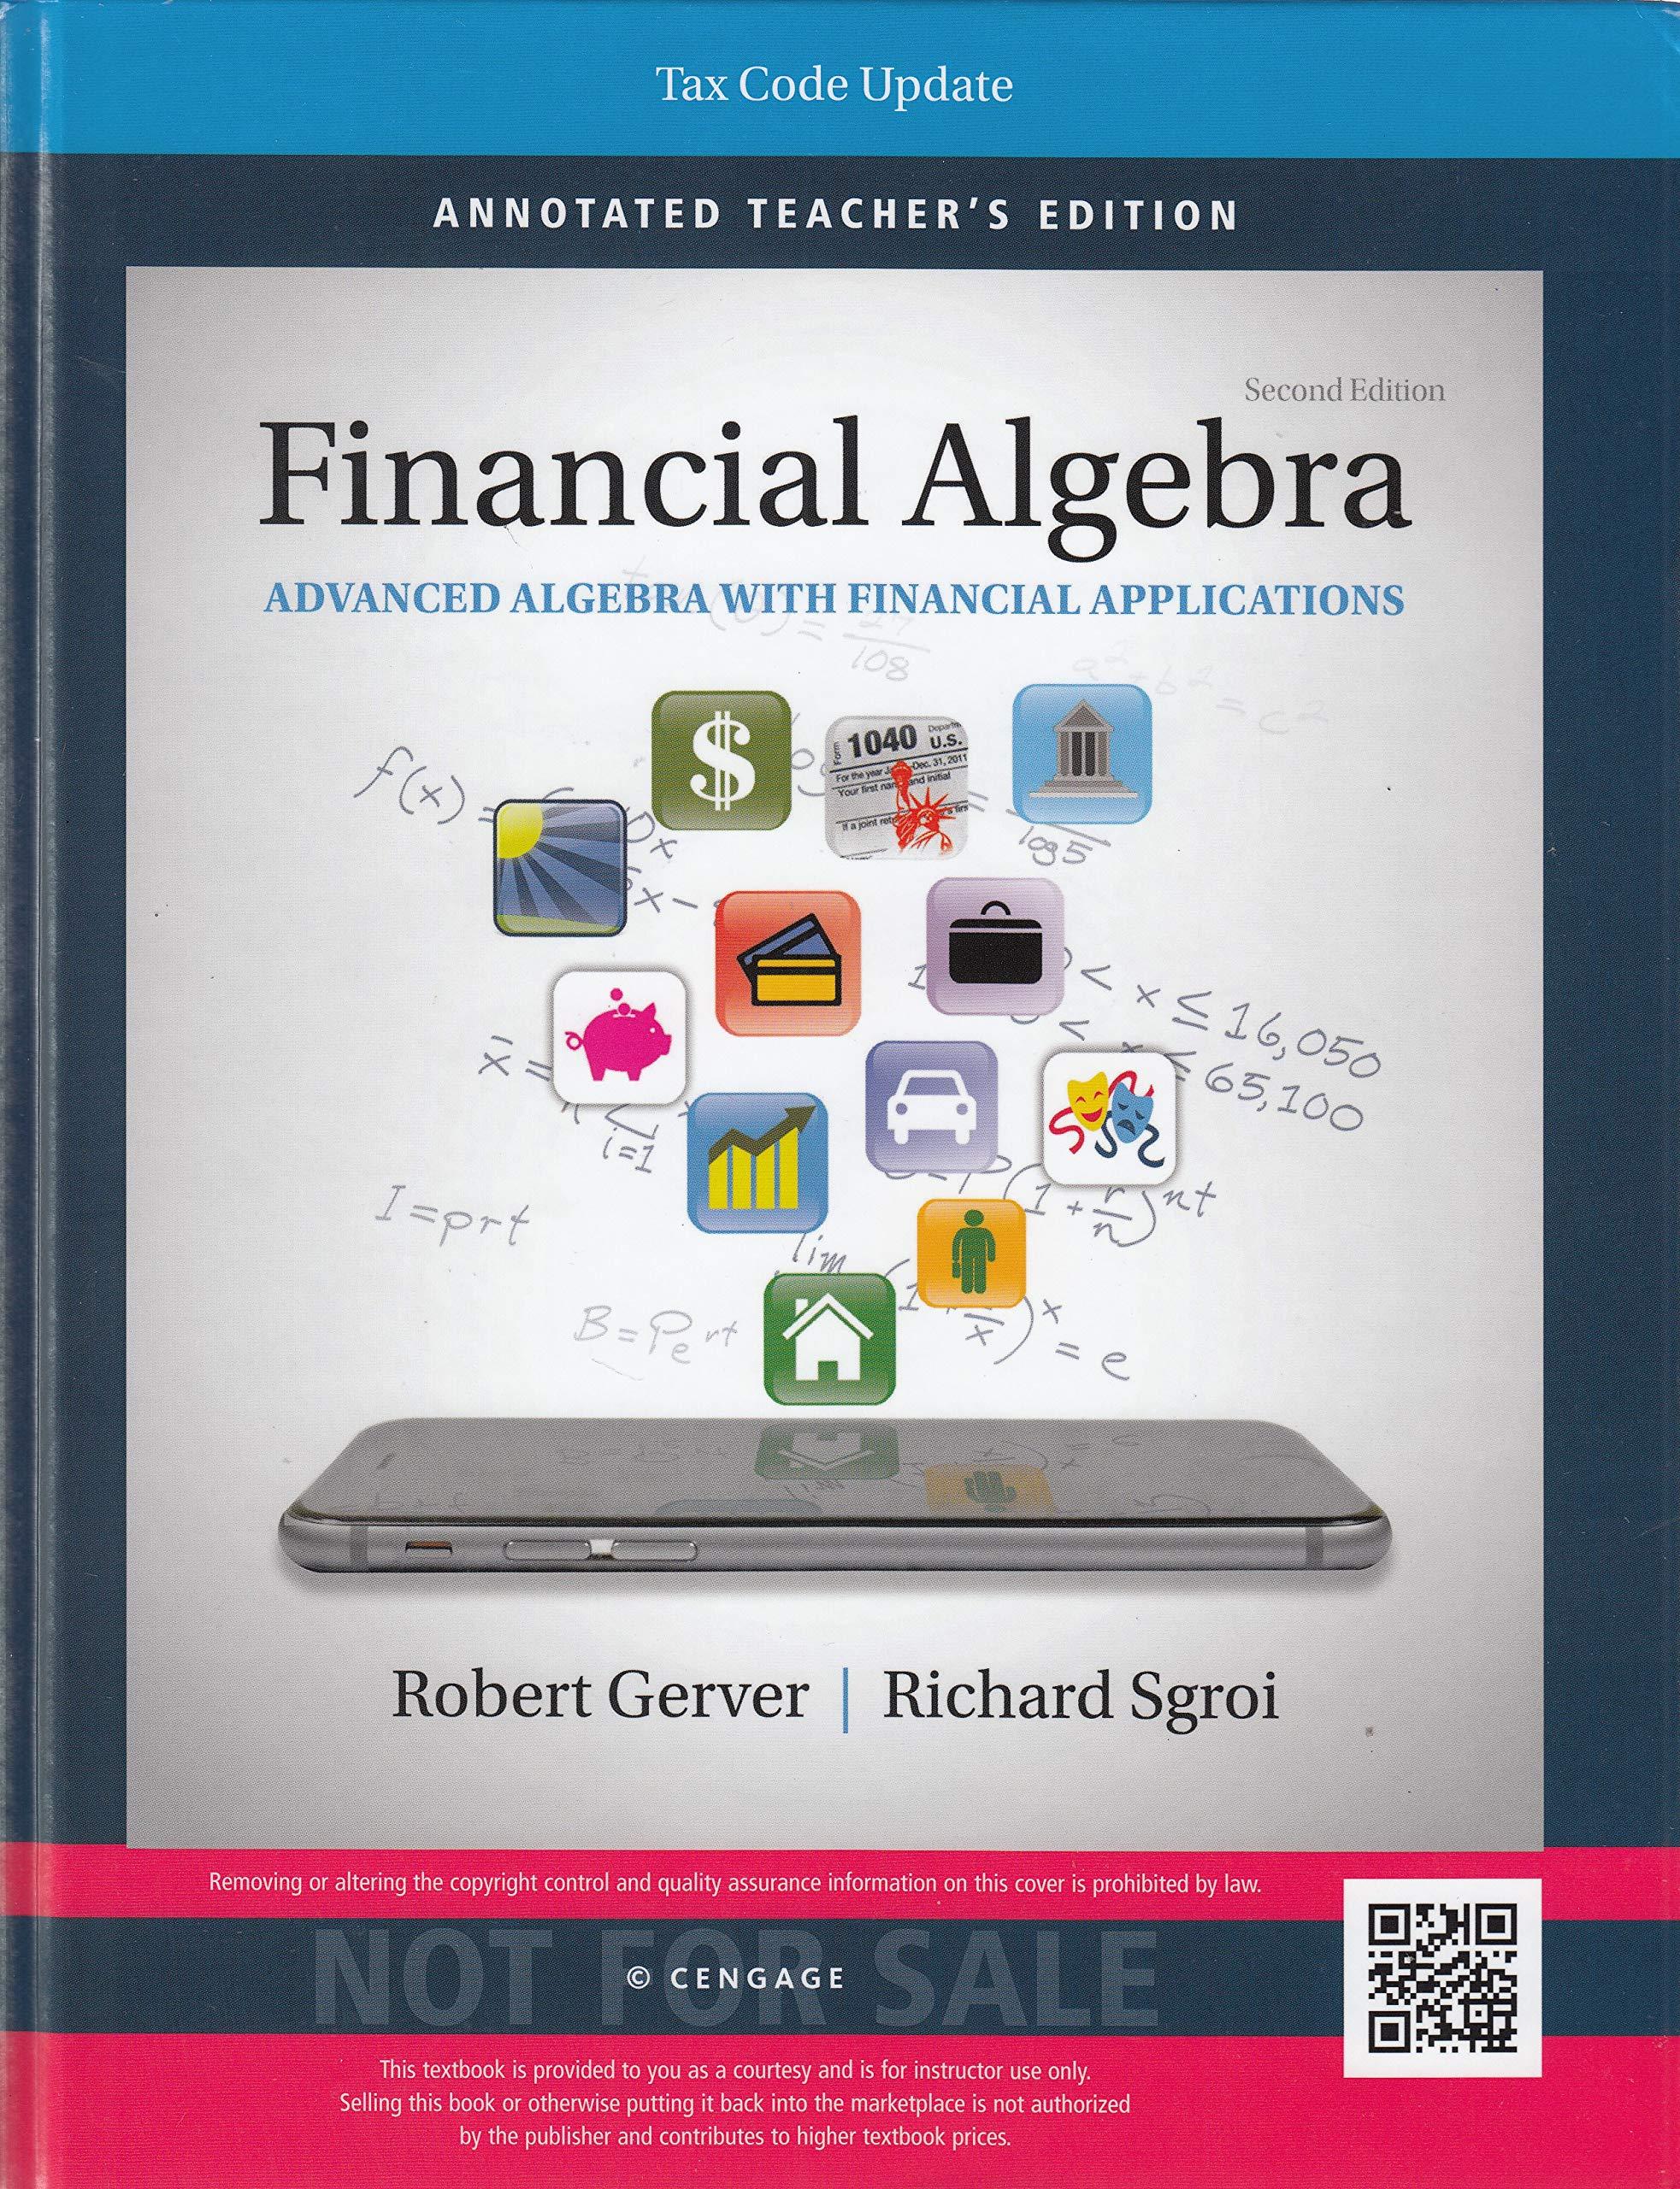 Financial Algebra Advanced Algebra With Financial Applications Second Edition Teacher S Edition Tax Code Update Amazon Com Books